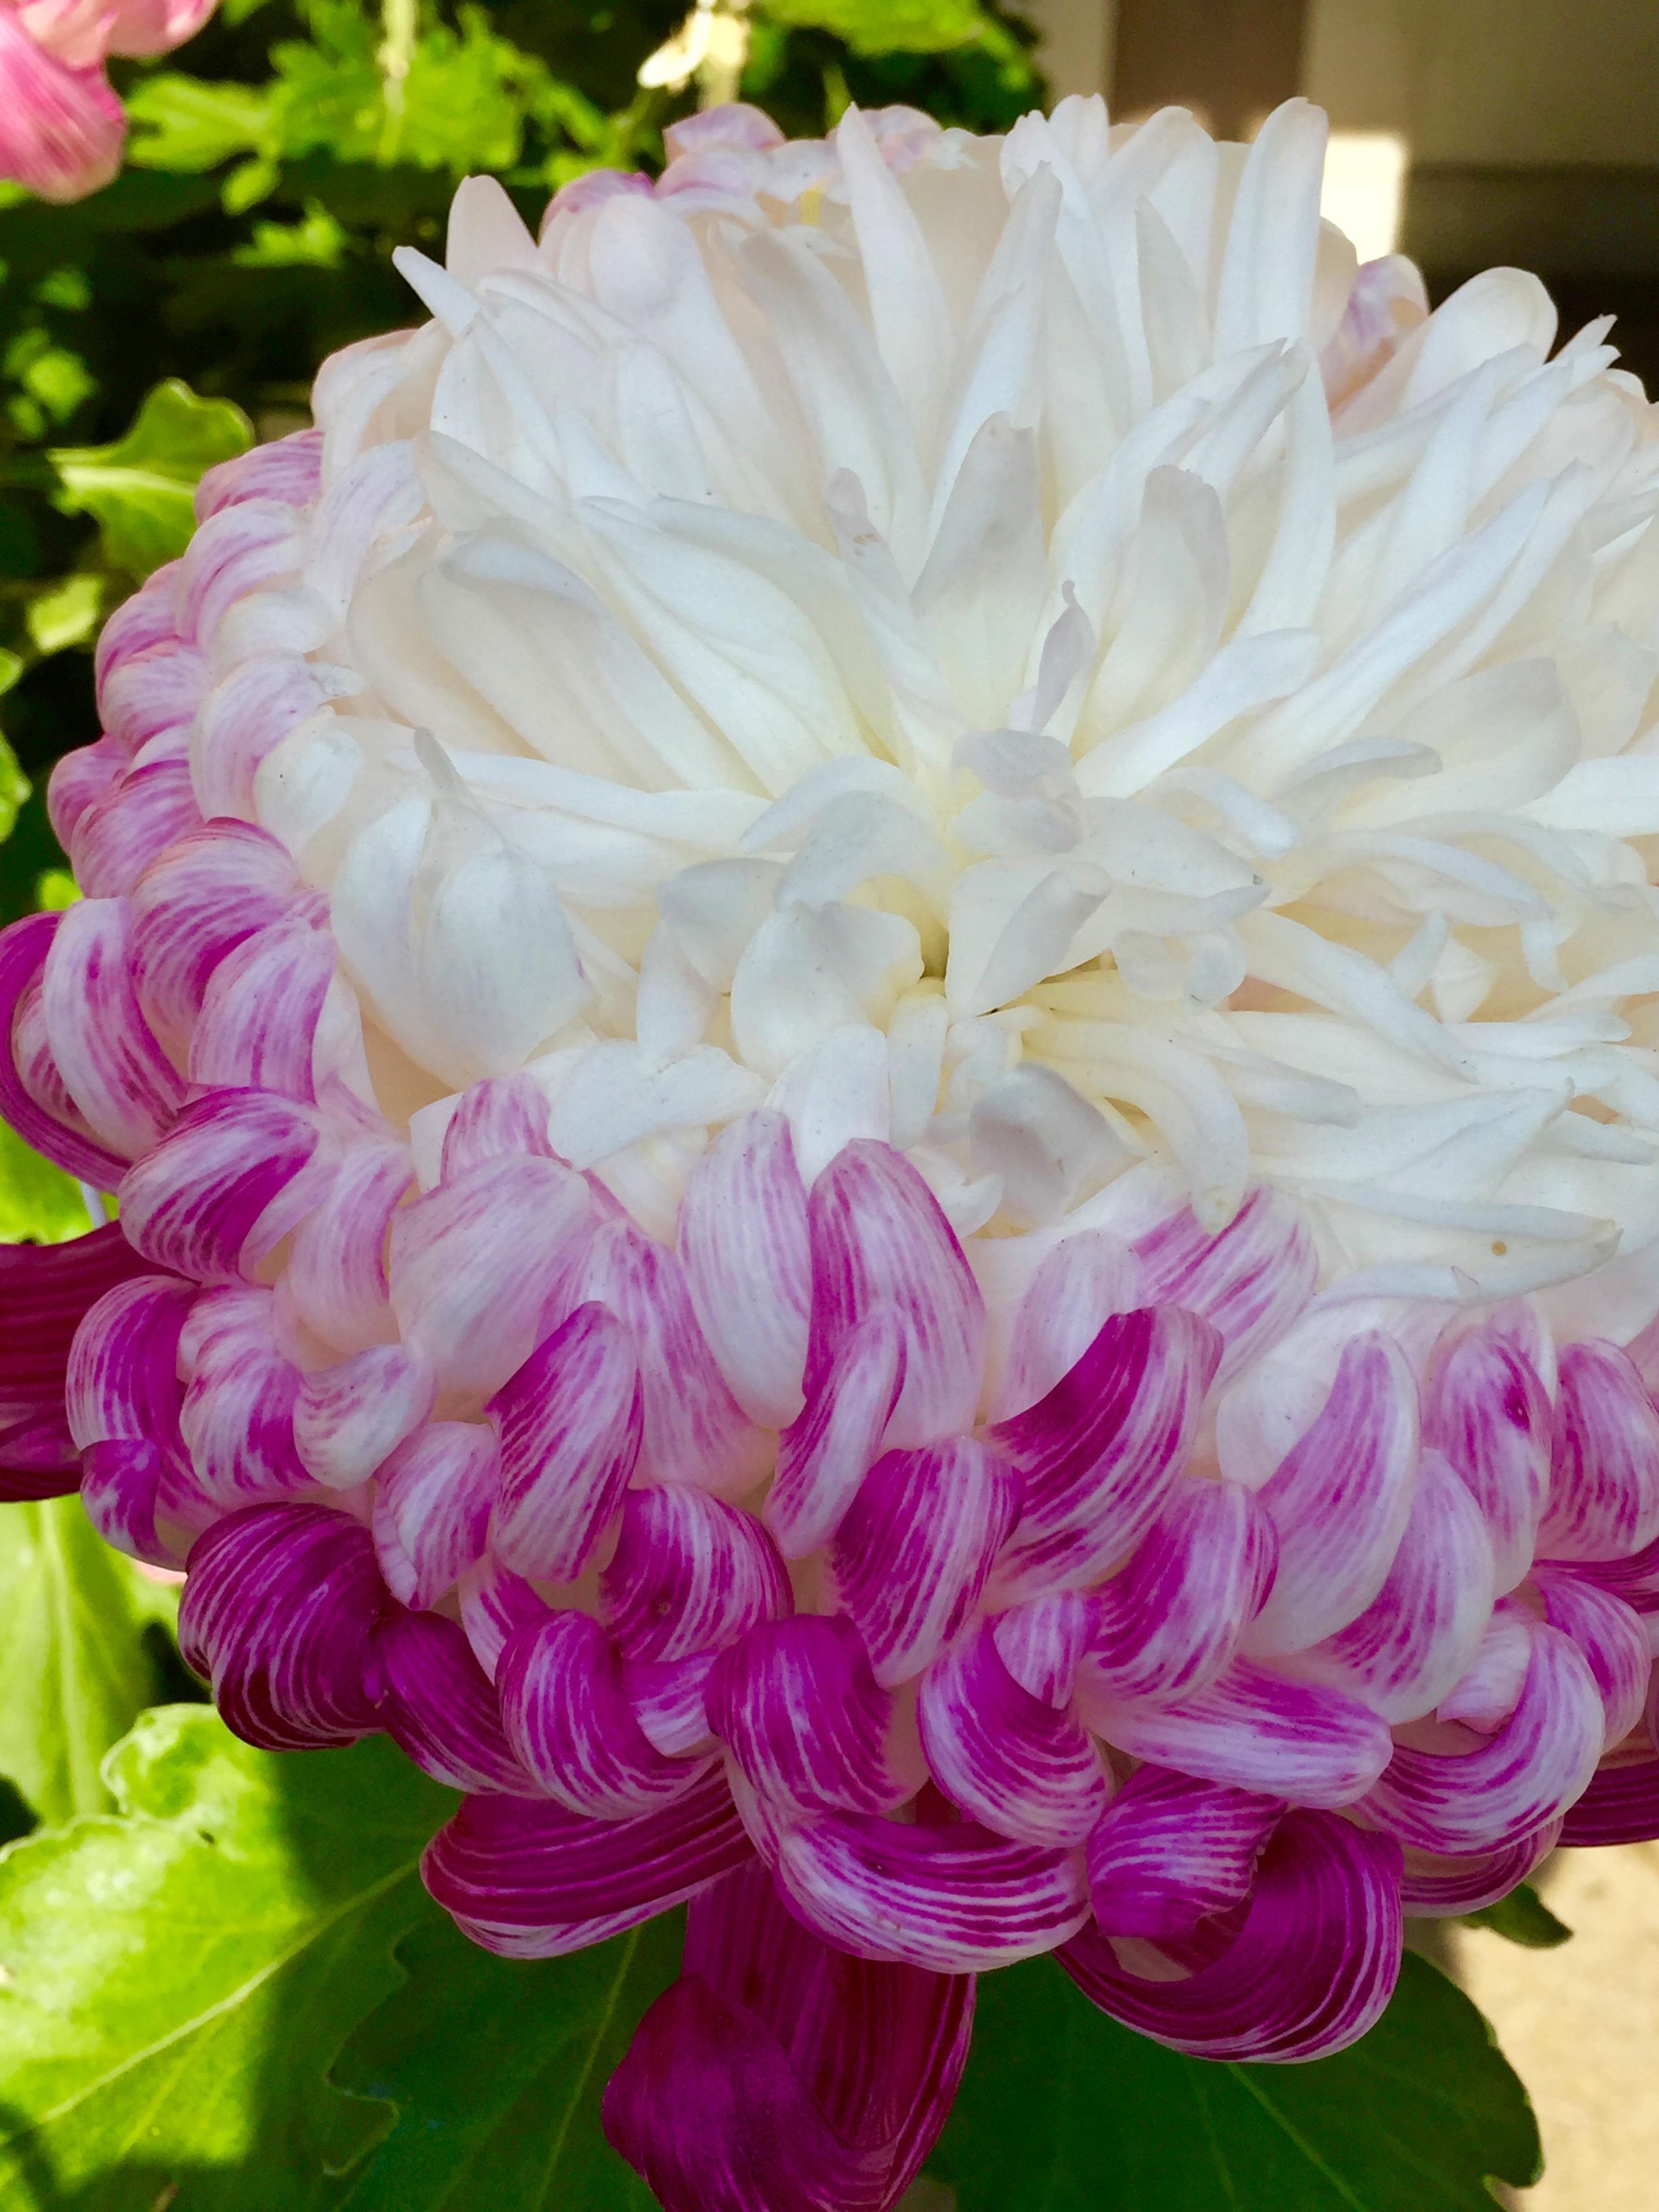 Kiku Understanding The Significance Of The Chrysanthemum